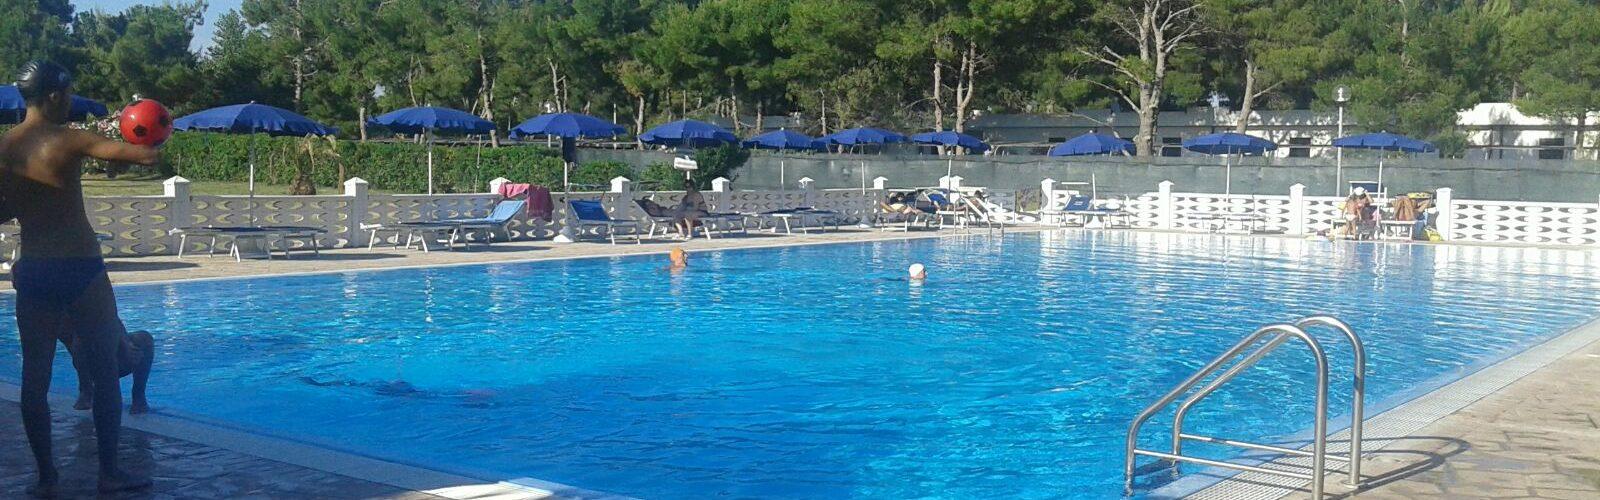 Villaggio Alga Blu - Piscina